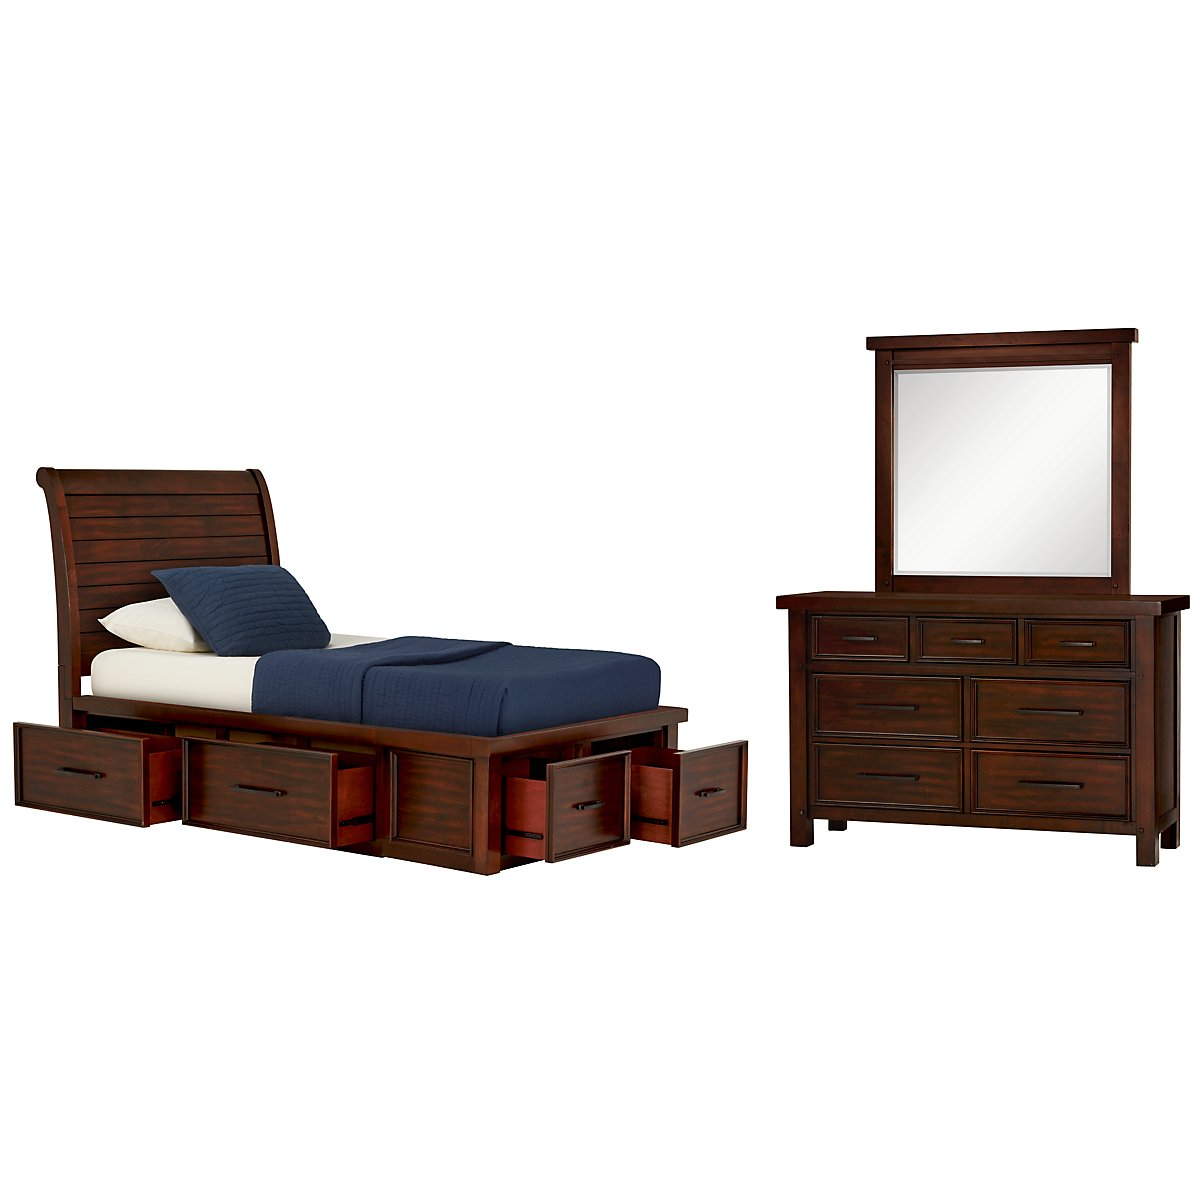 Napa Bedroom Furniture City Furniture Napa Dark Tone Sleigh Storage Bedroom